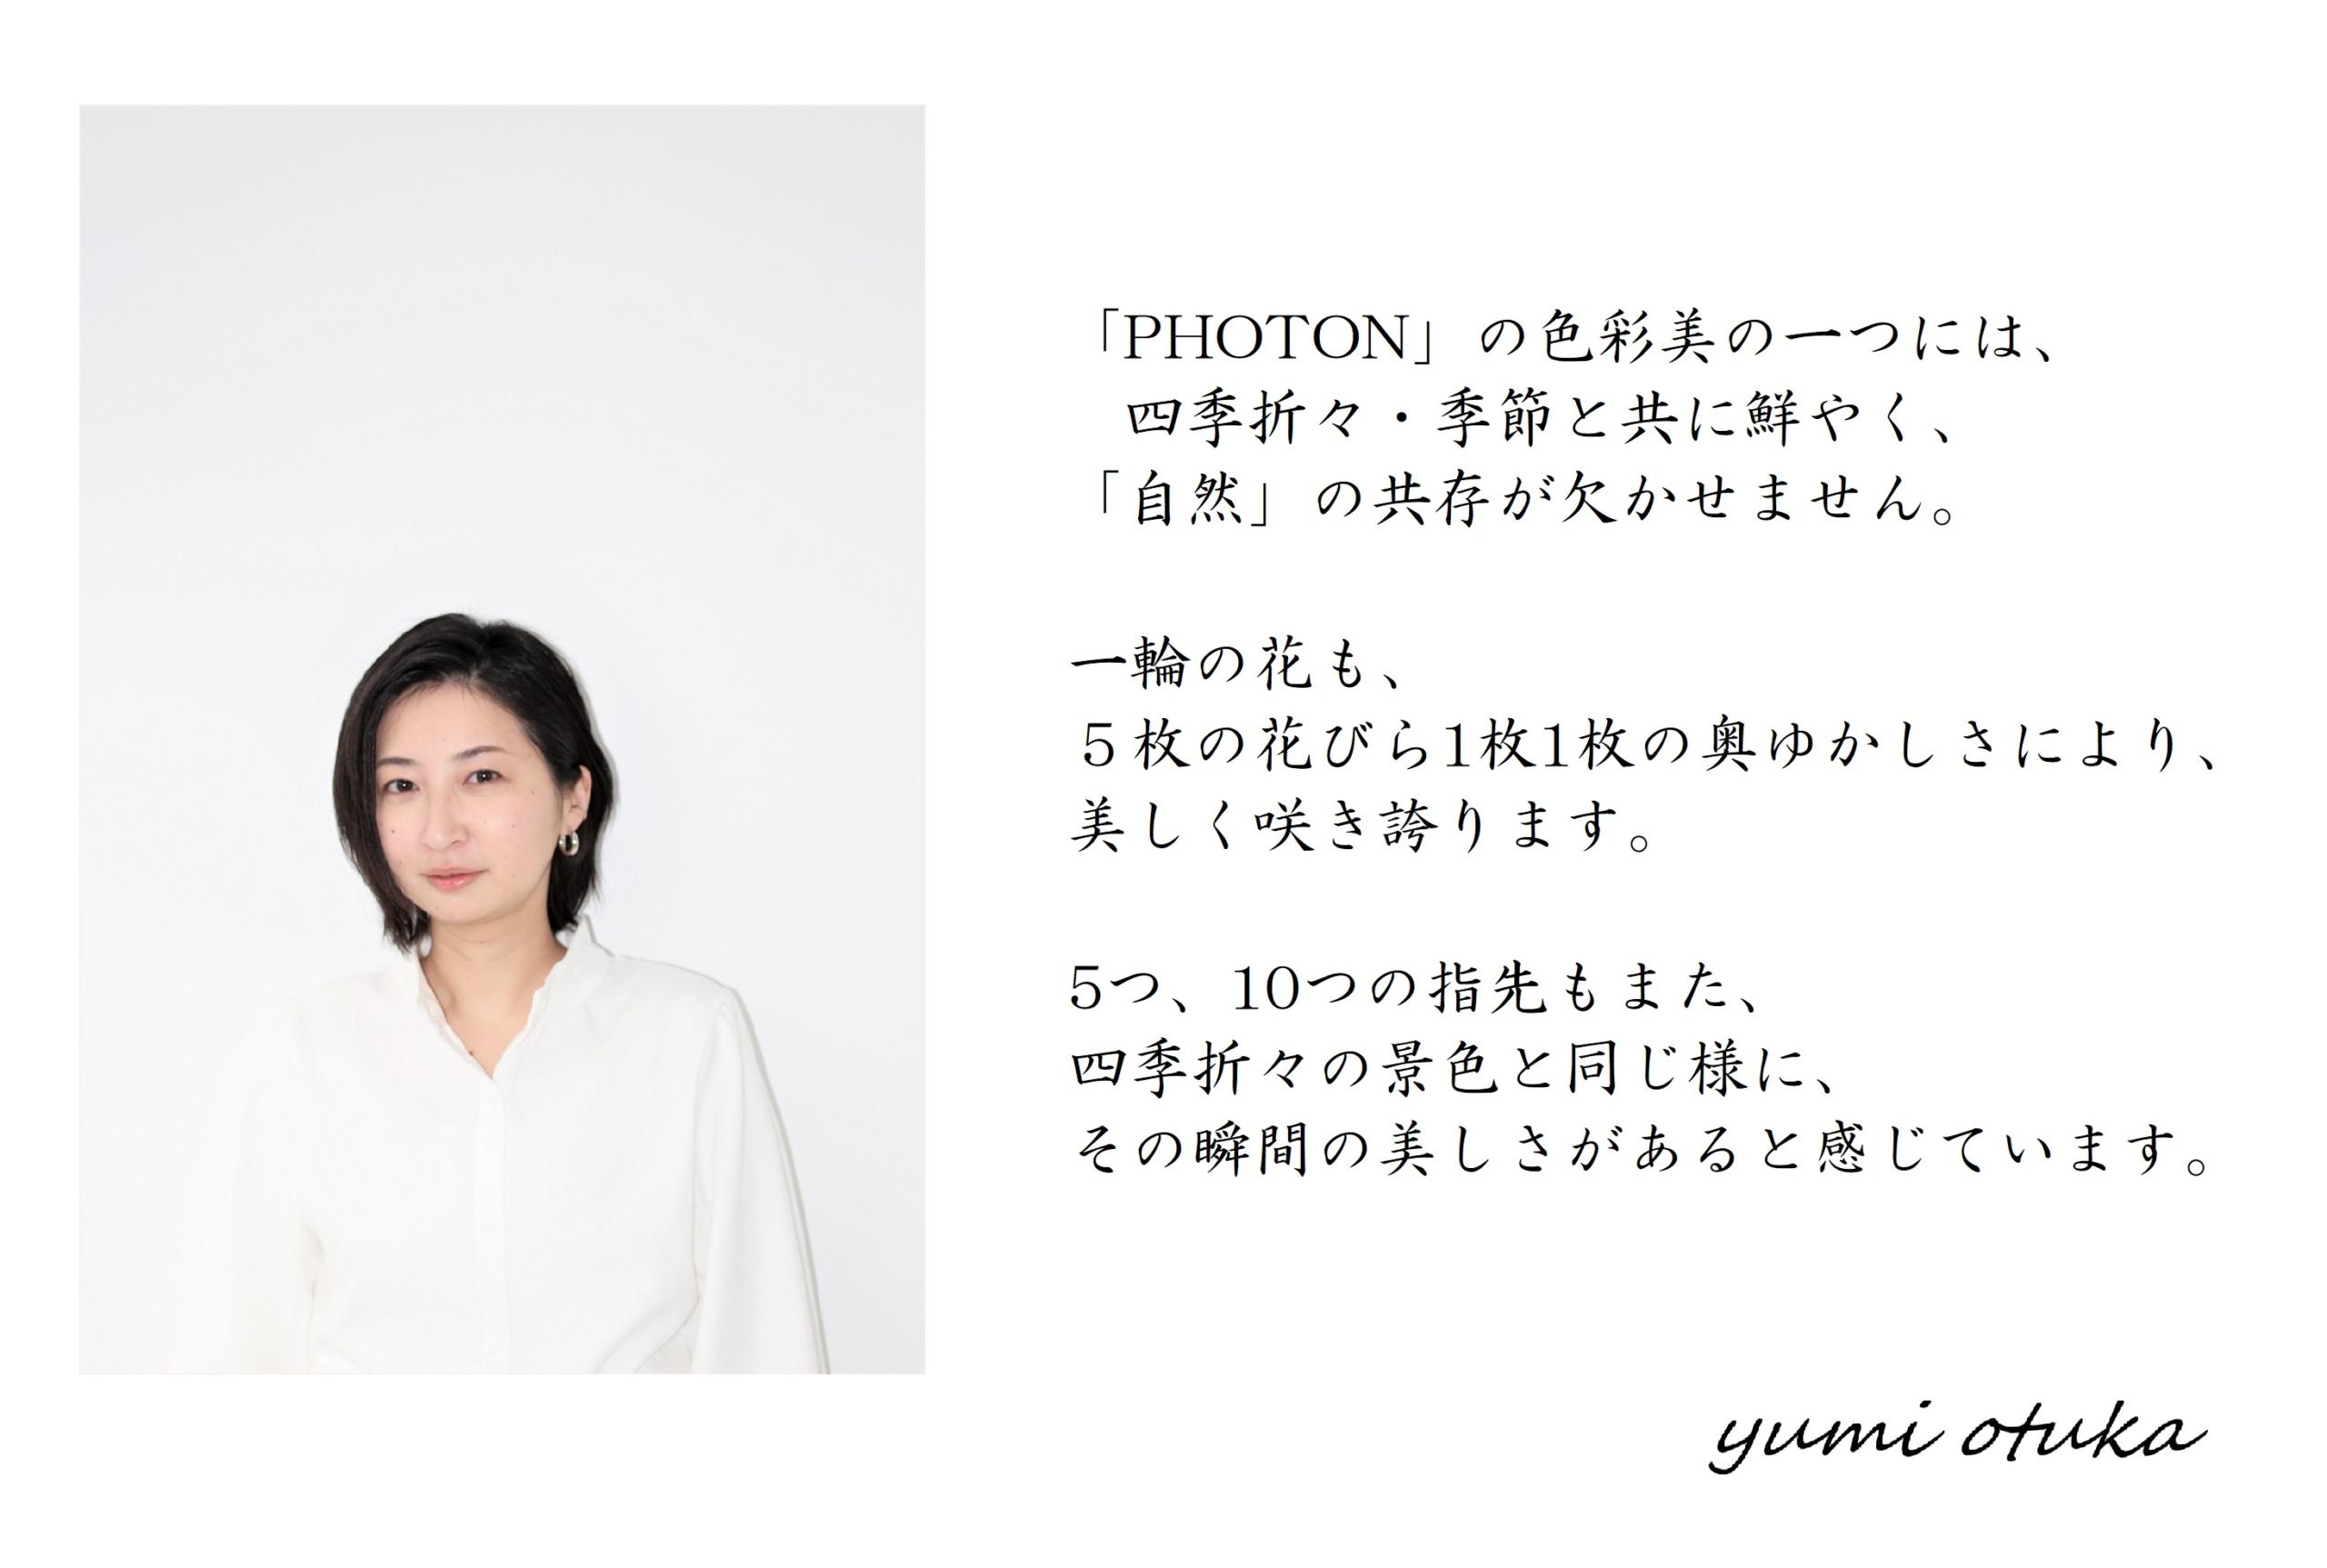 yumi otuka ネイリスト nail artist │ PHOTON ( フォトン )│private nail art lab Tokyo│ プライベート ネイル サロン │ 表参道 東京